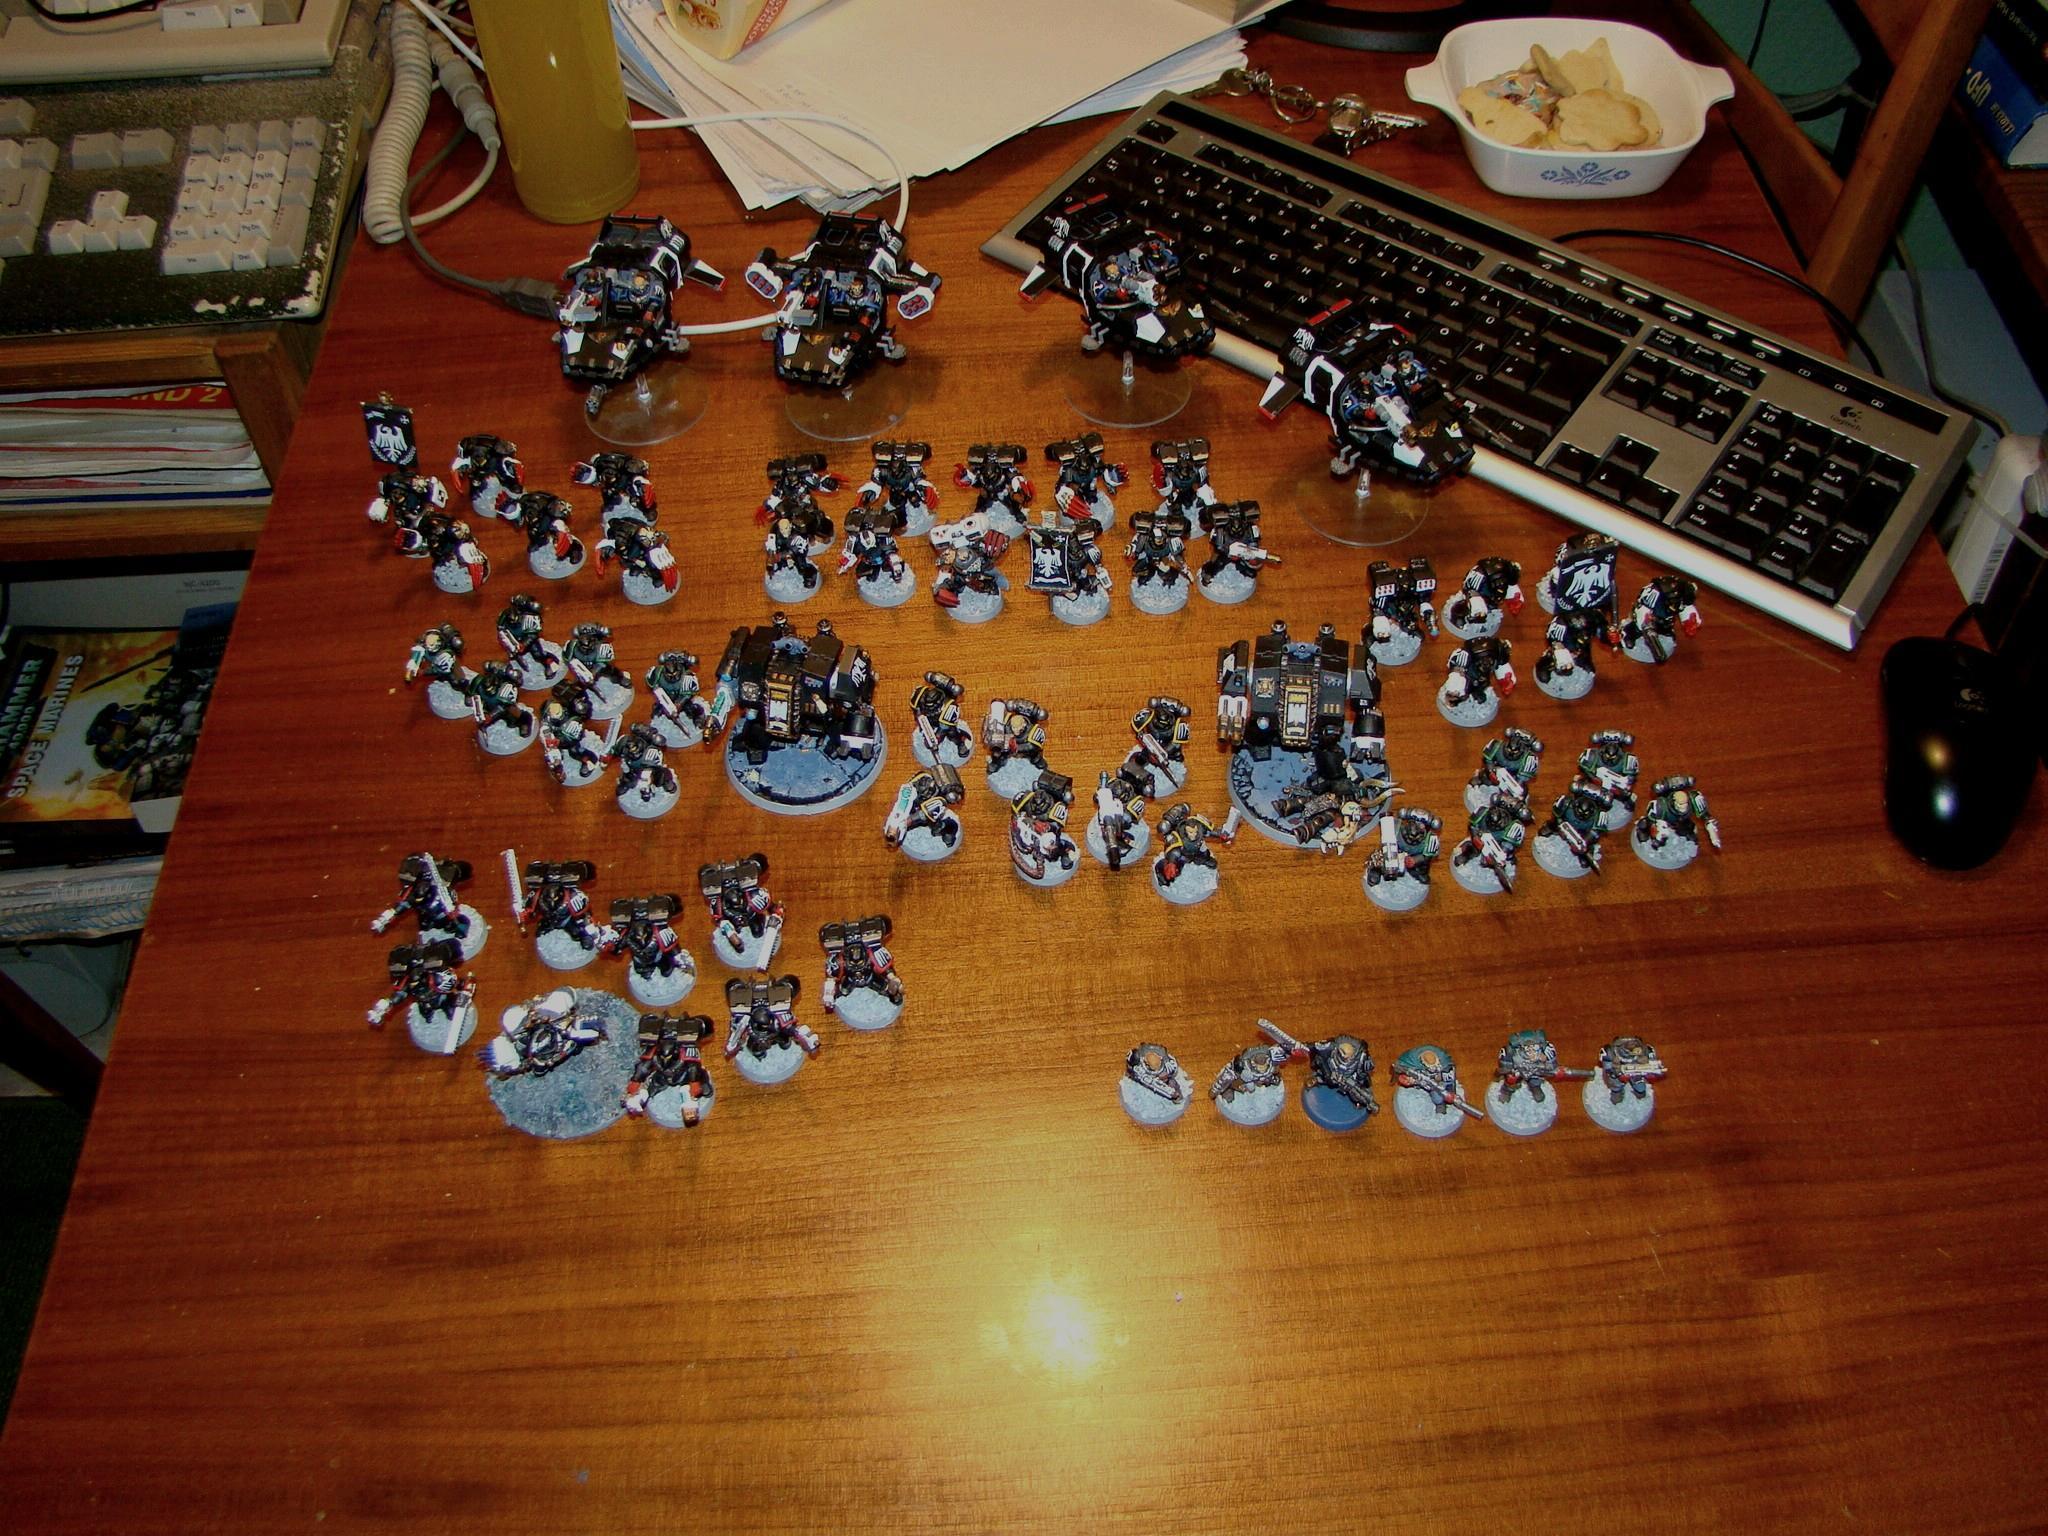 Raven Guard, Space Marines, Warhammer 40,000